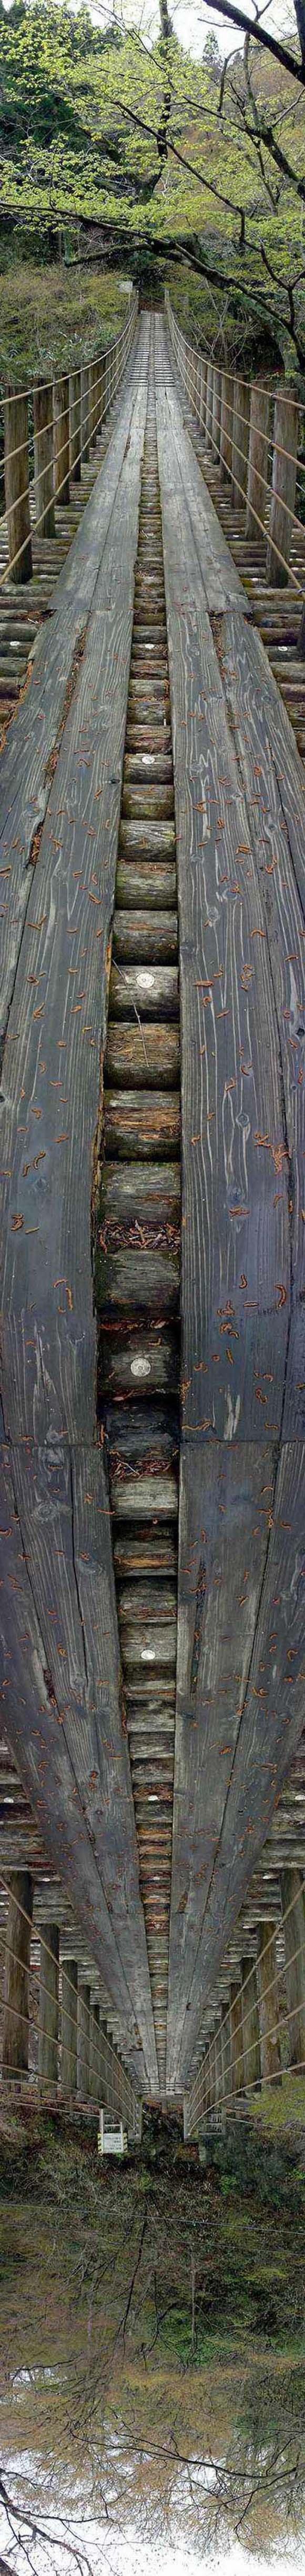 wooden bridge illusion. wooden bridge illusion.. EPIC! lulz wooden bridge il